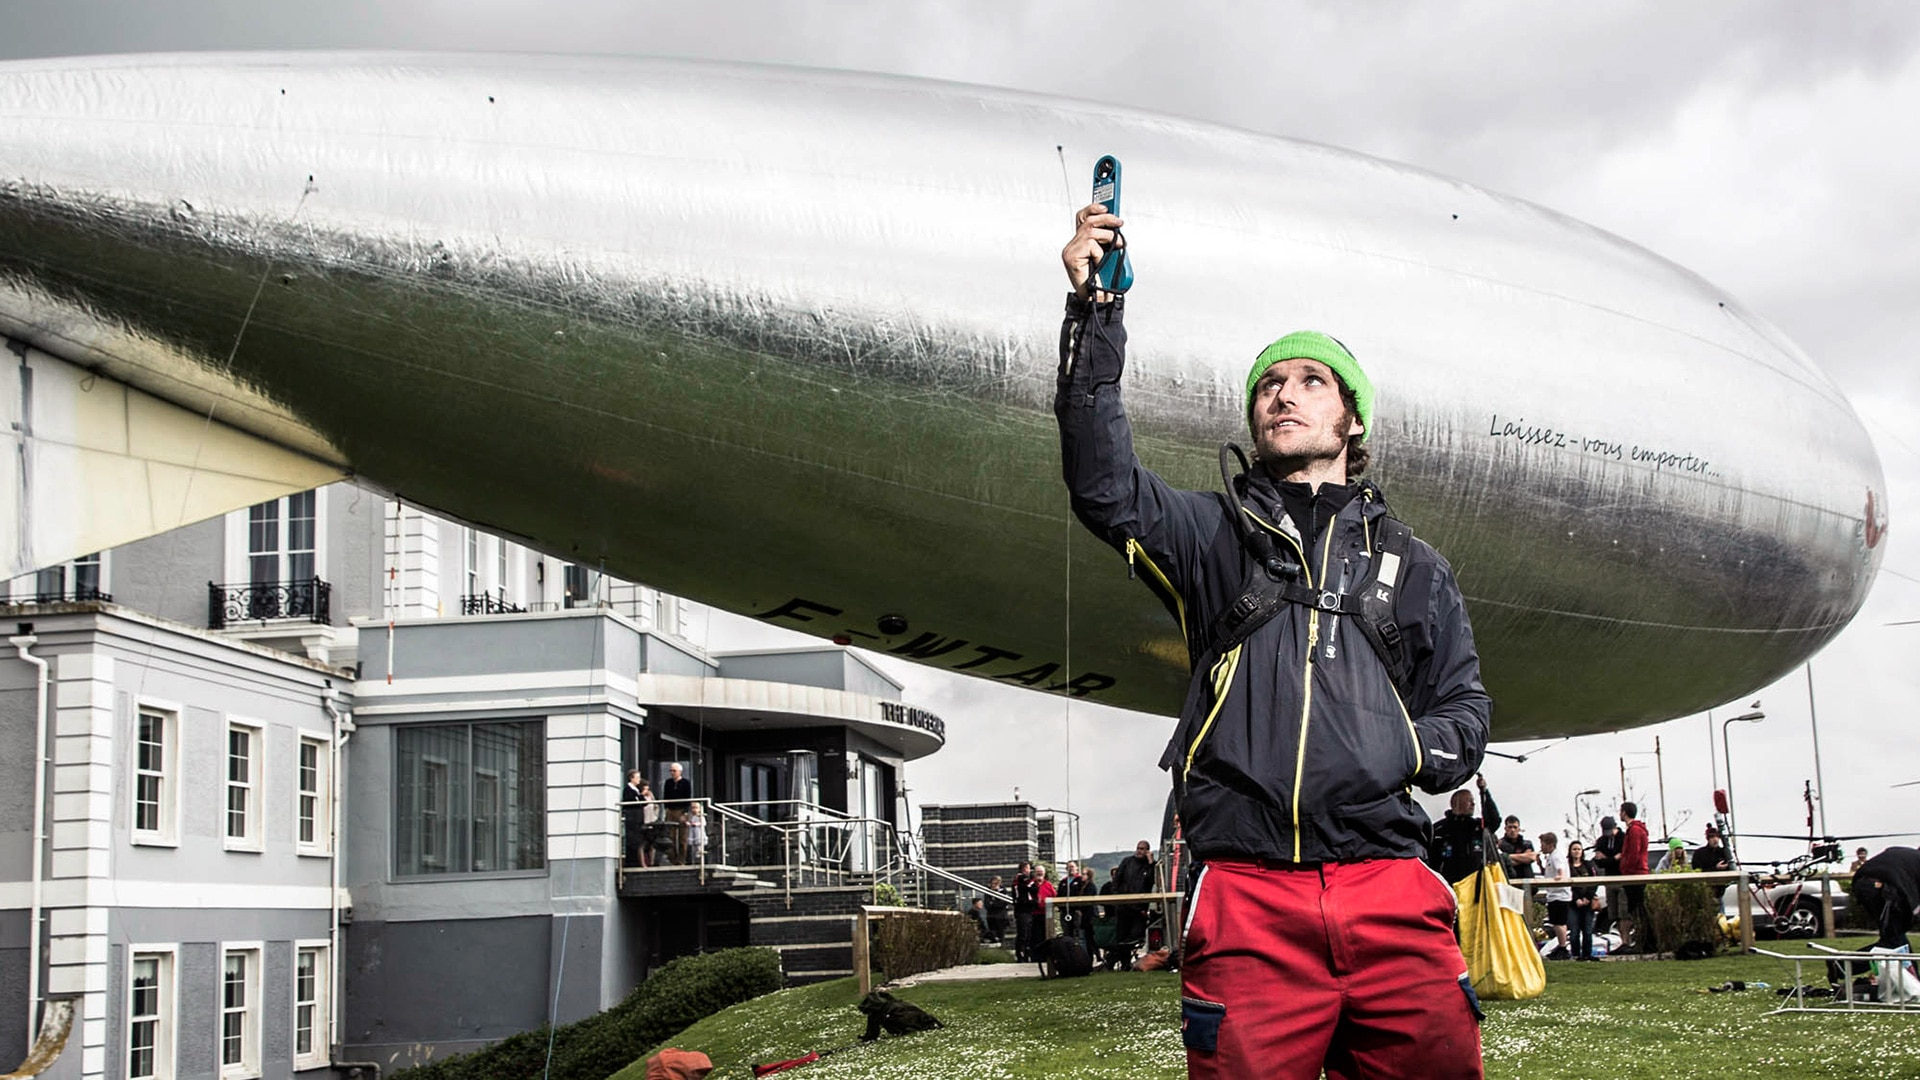 Series 3 Episode 2: Pedal-Powered Airship